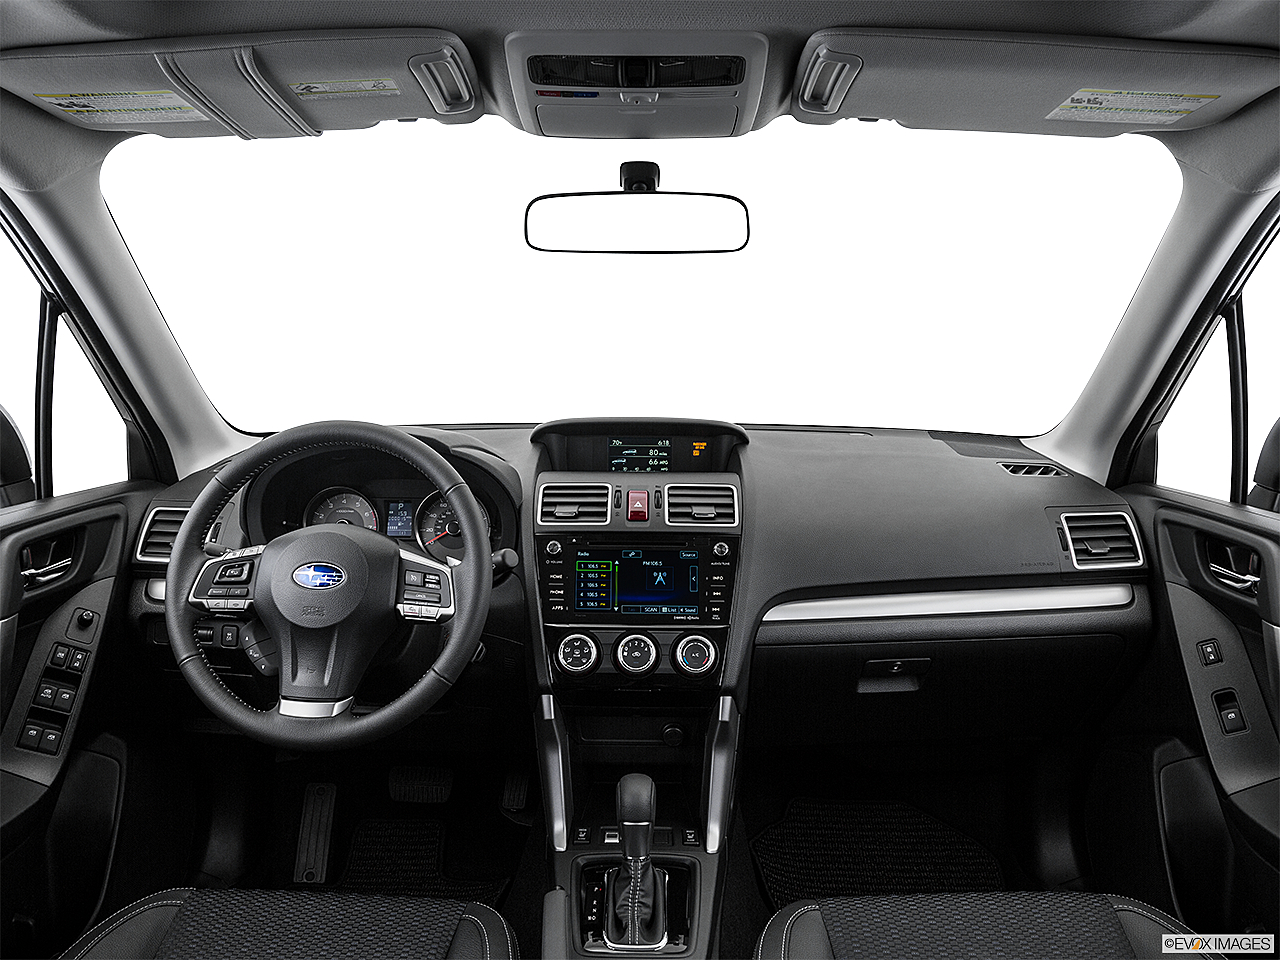 2016 Subaru Forester 2 0xt Premium Centered Wide Dash Shot